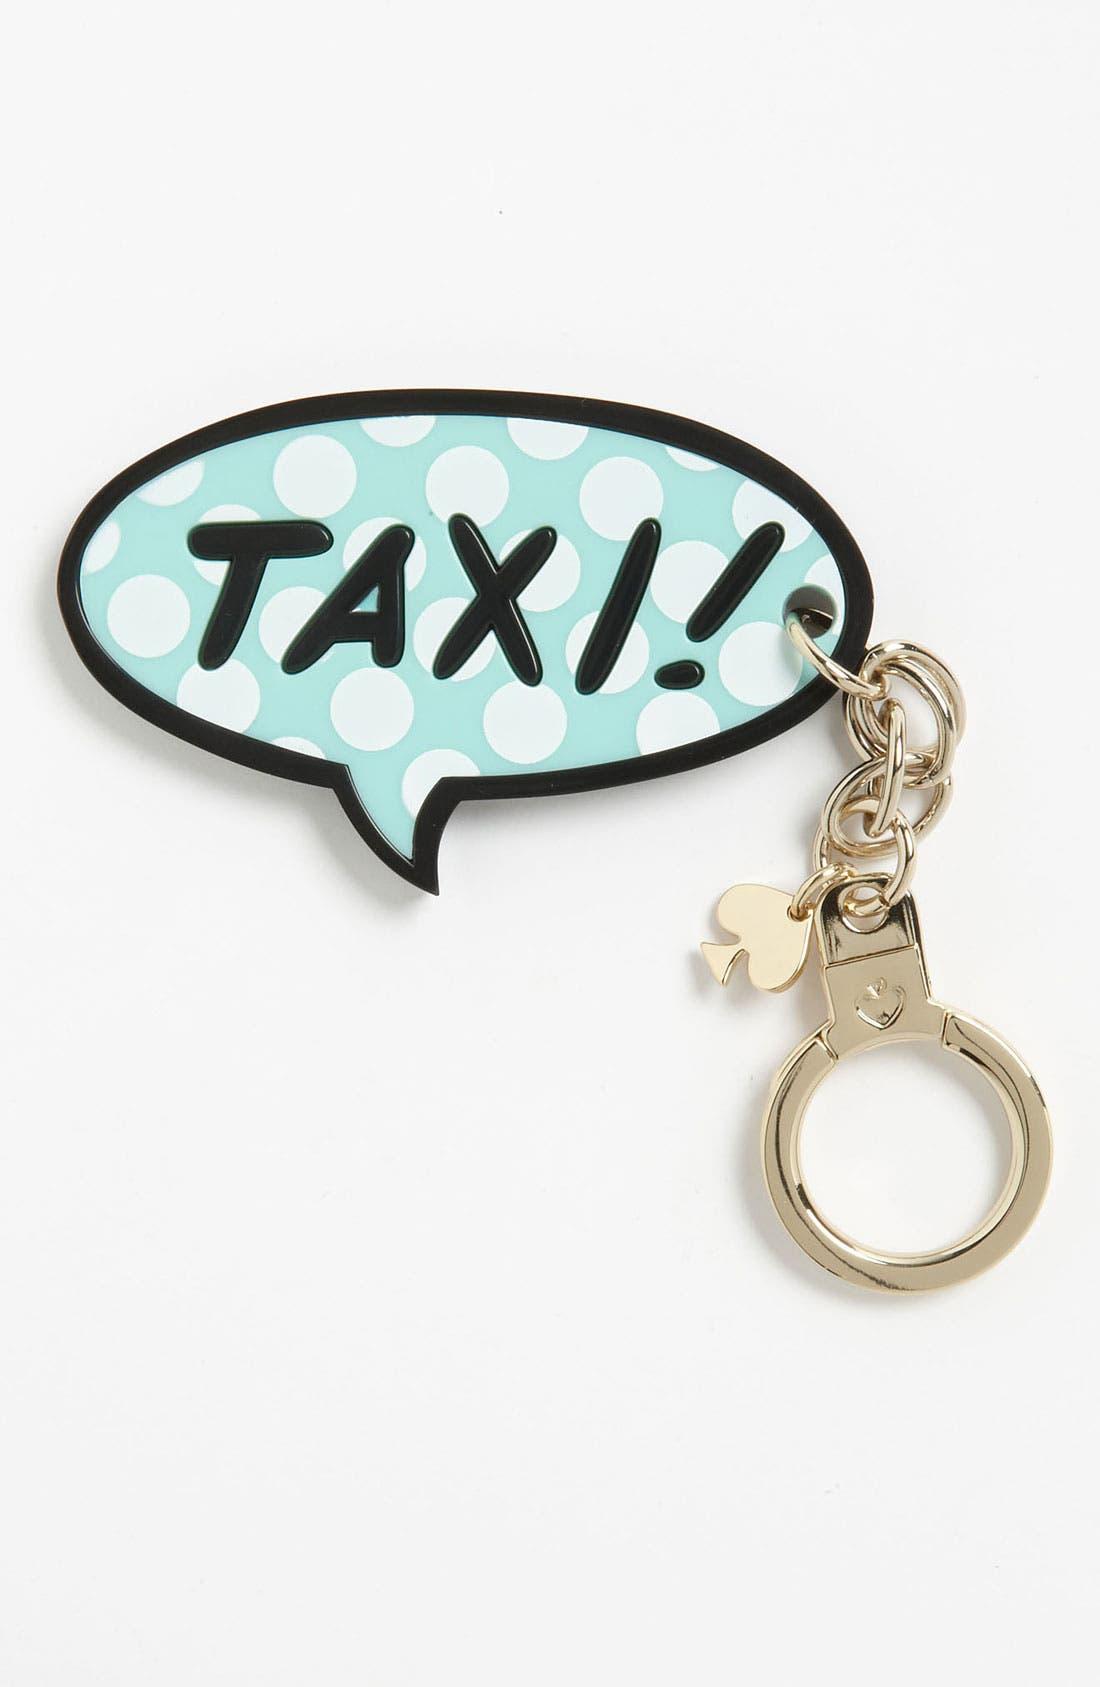 Alternate Image 1 Selected - kate spade new york 'taxi' key ring